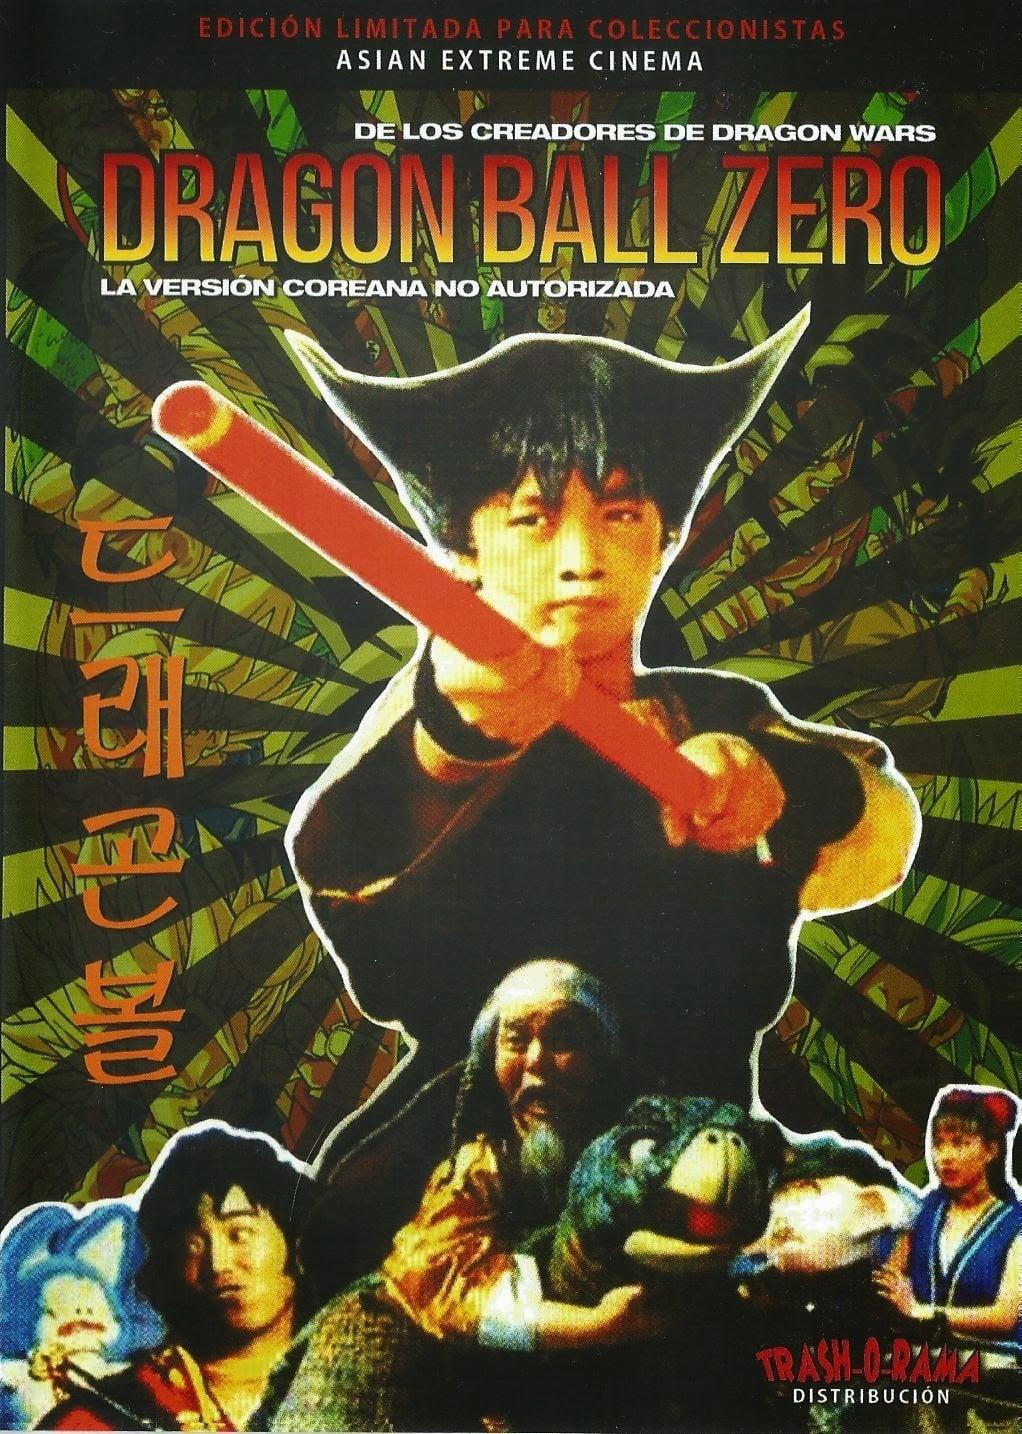 Dragon Ball: Fight Son Goku, Win Son Goku